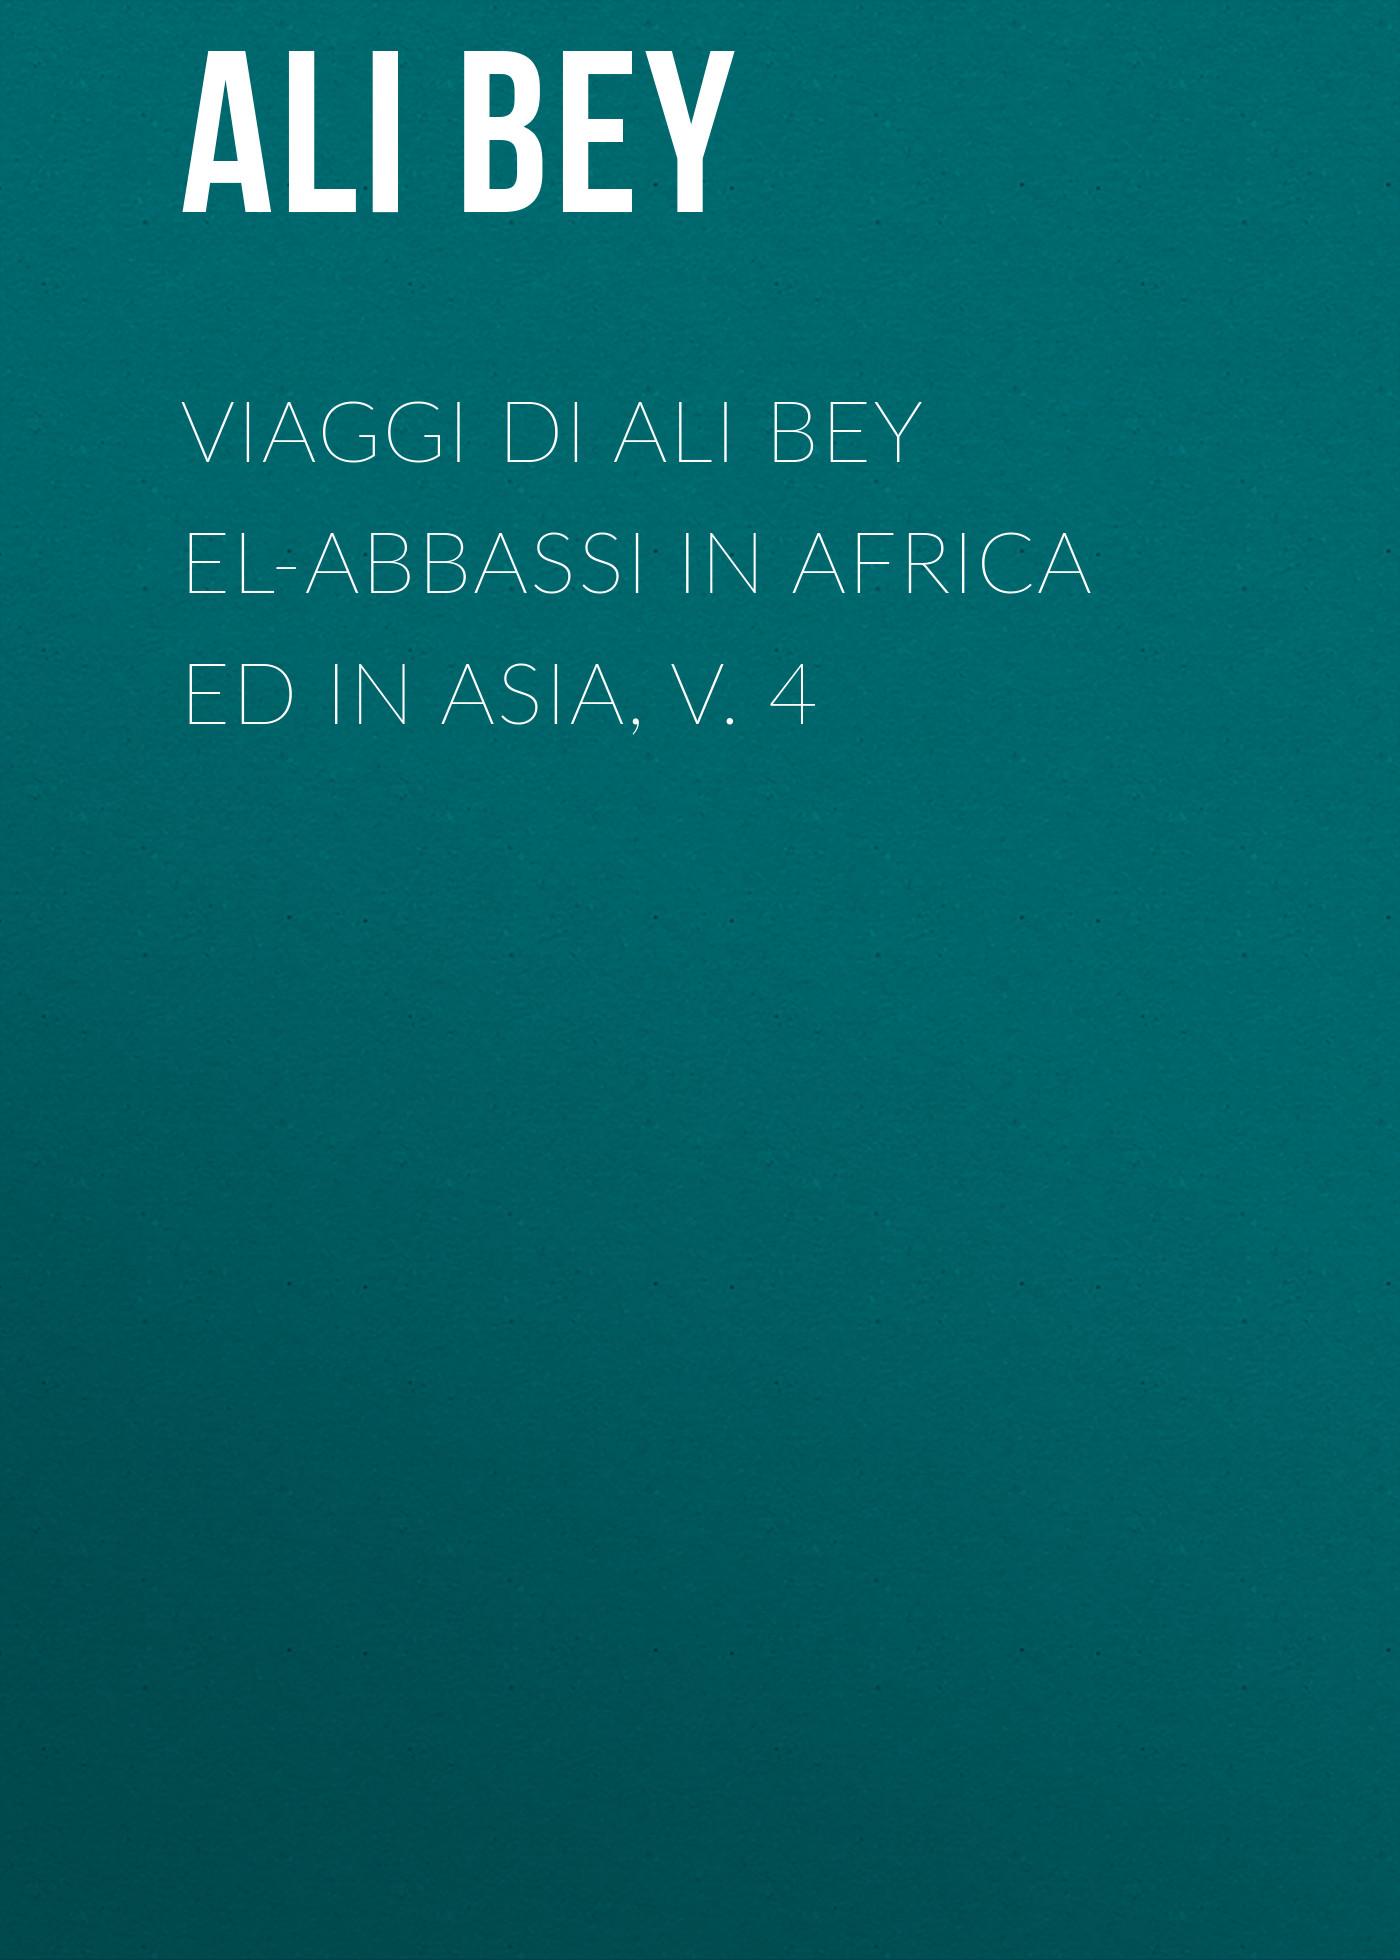 Ali Bey Viaggi di Ali Bey el-Abbassi in Africa ed in Asia, v. 4 dawoud bey